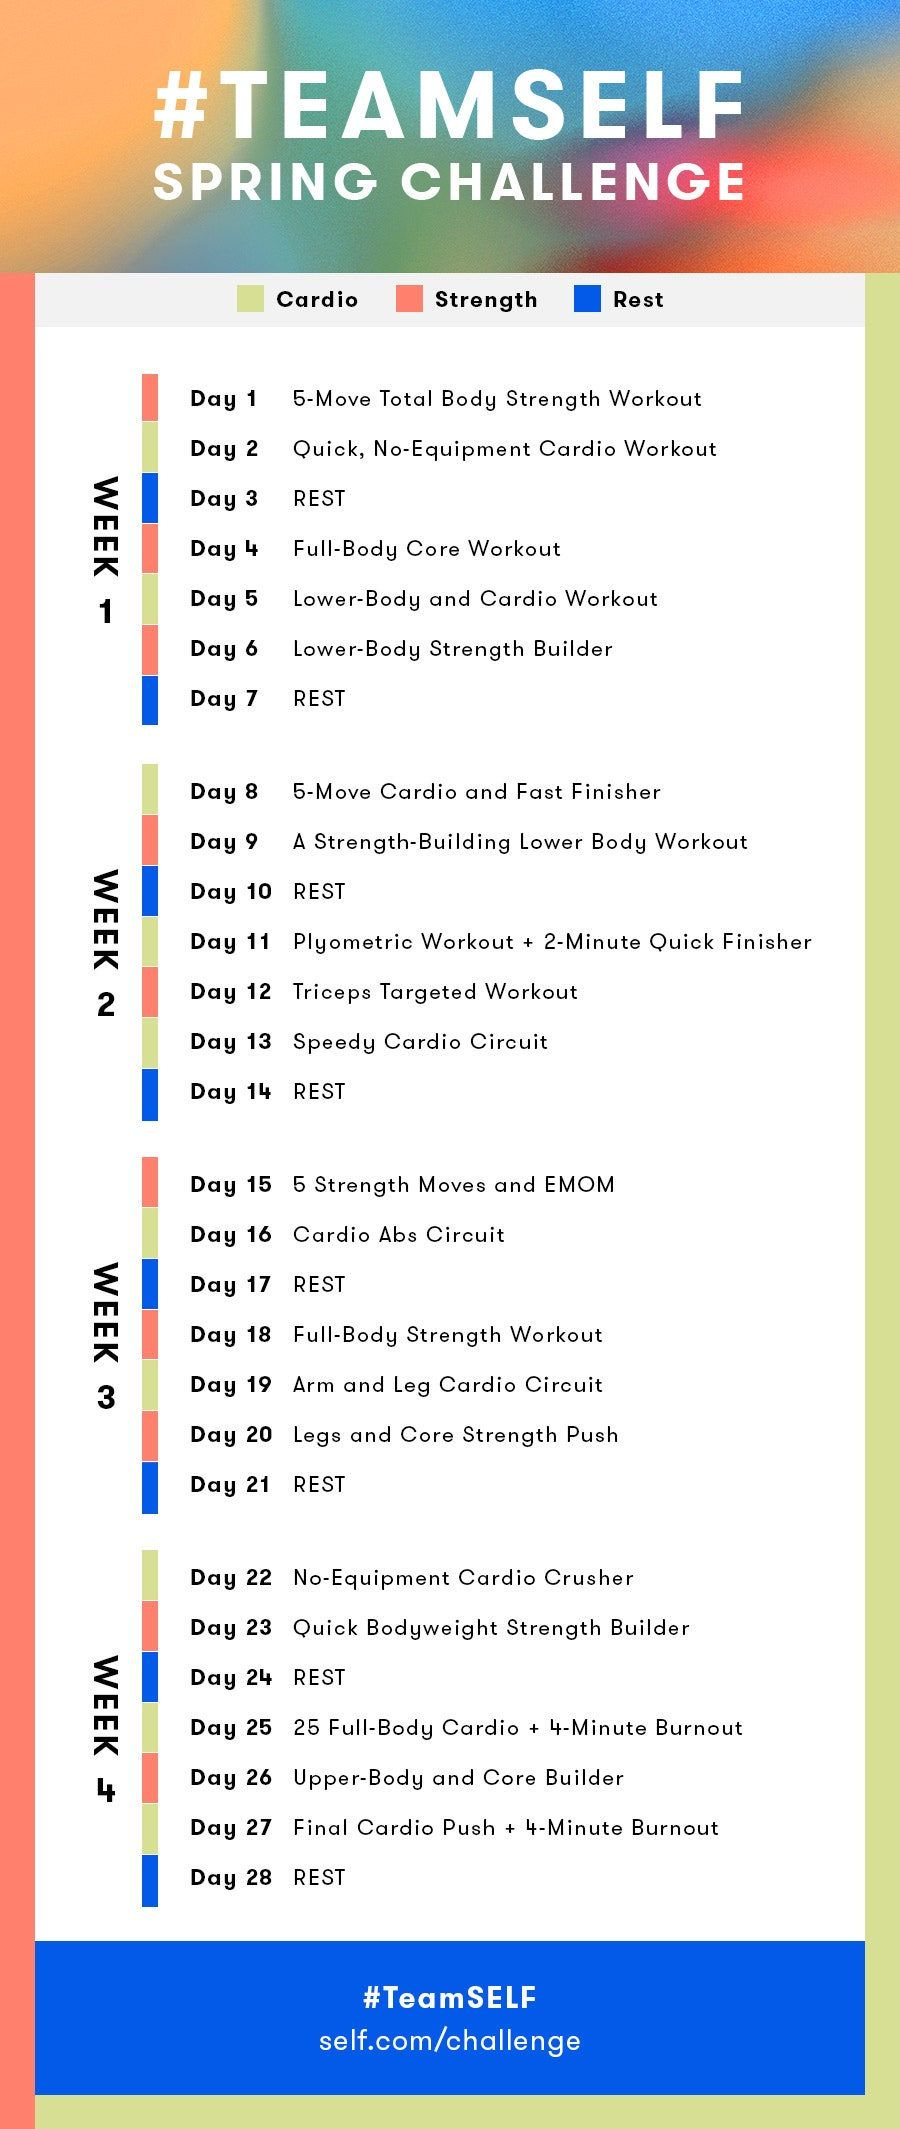 Team Self 2020 Spring Challenge Workout Calendar In 2020 Workout Calendar Spring Challenge Workout Challenge